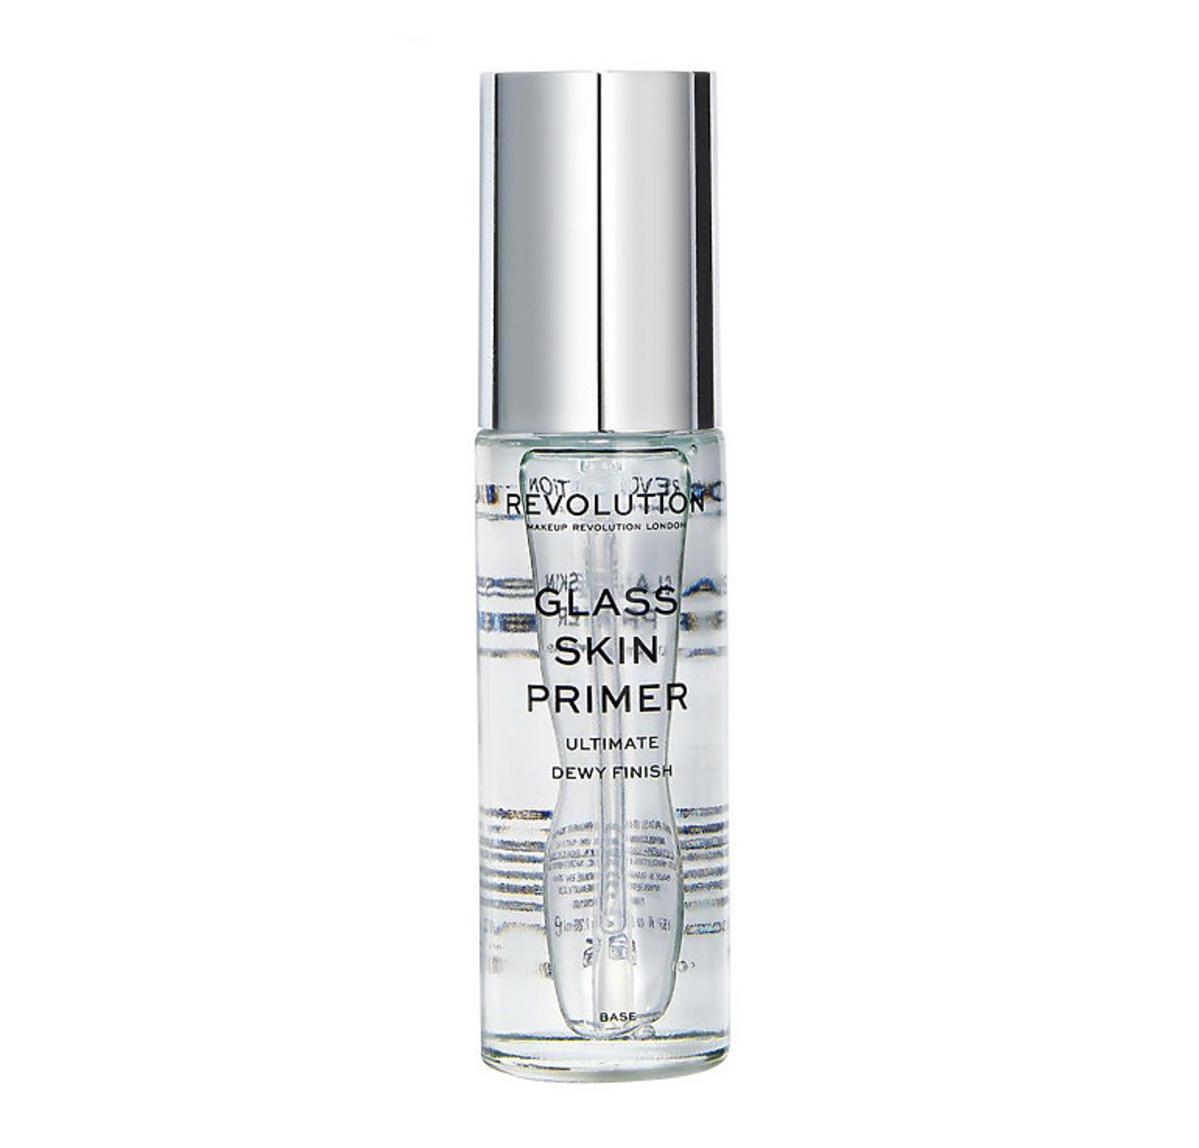 Glass Glow Skin marki Makeup Revolution